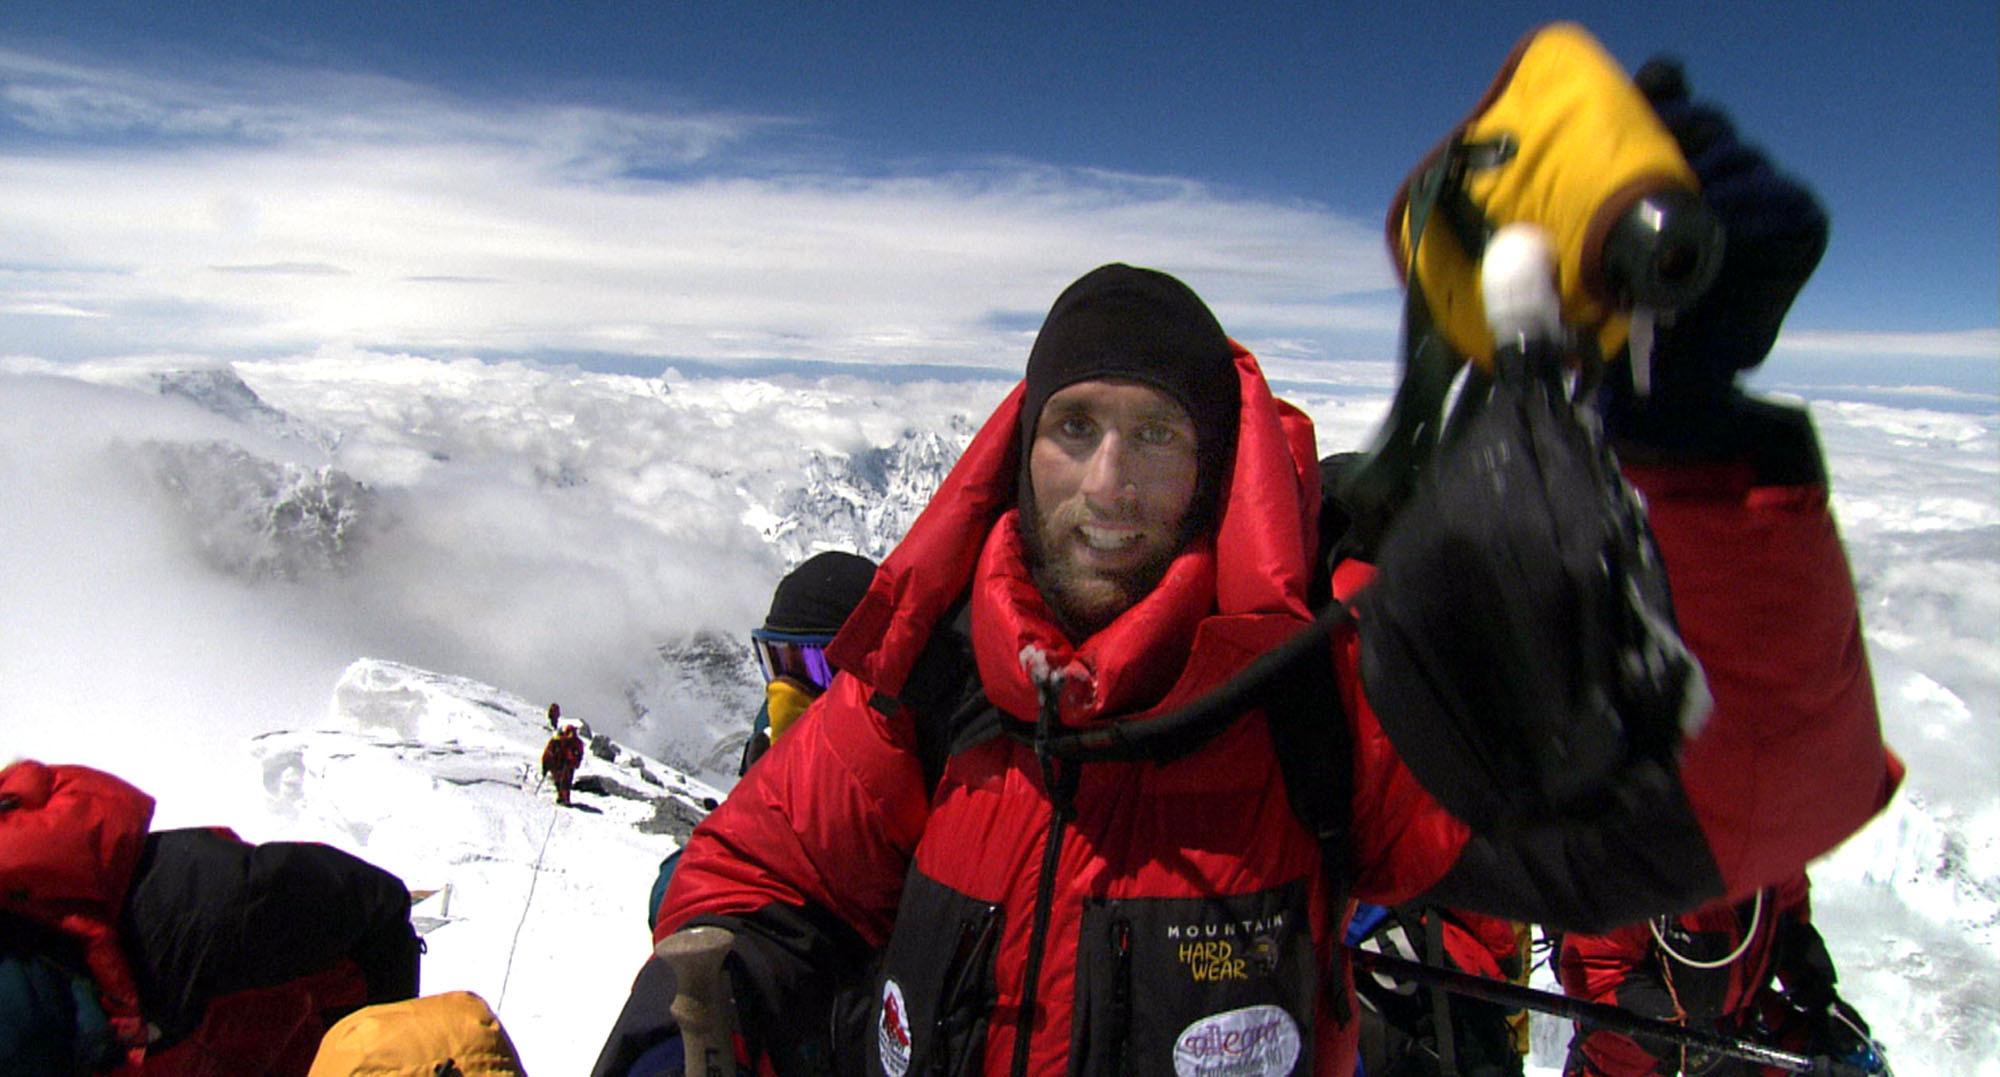 Erik Everest